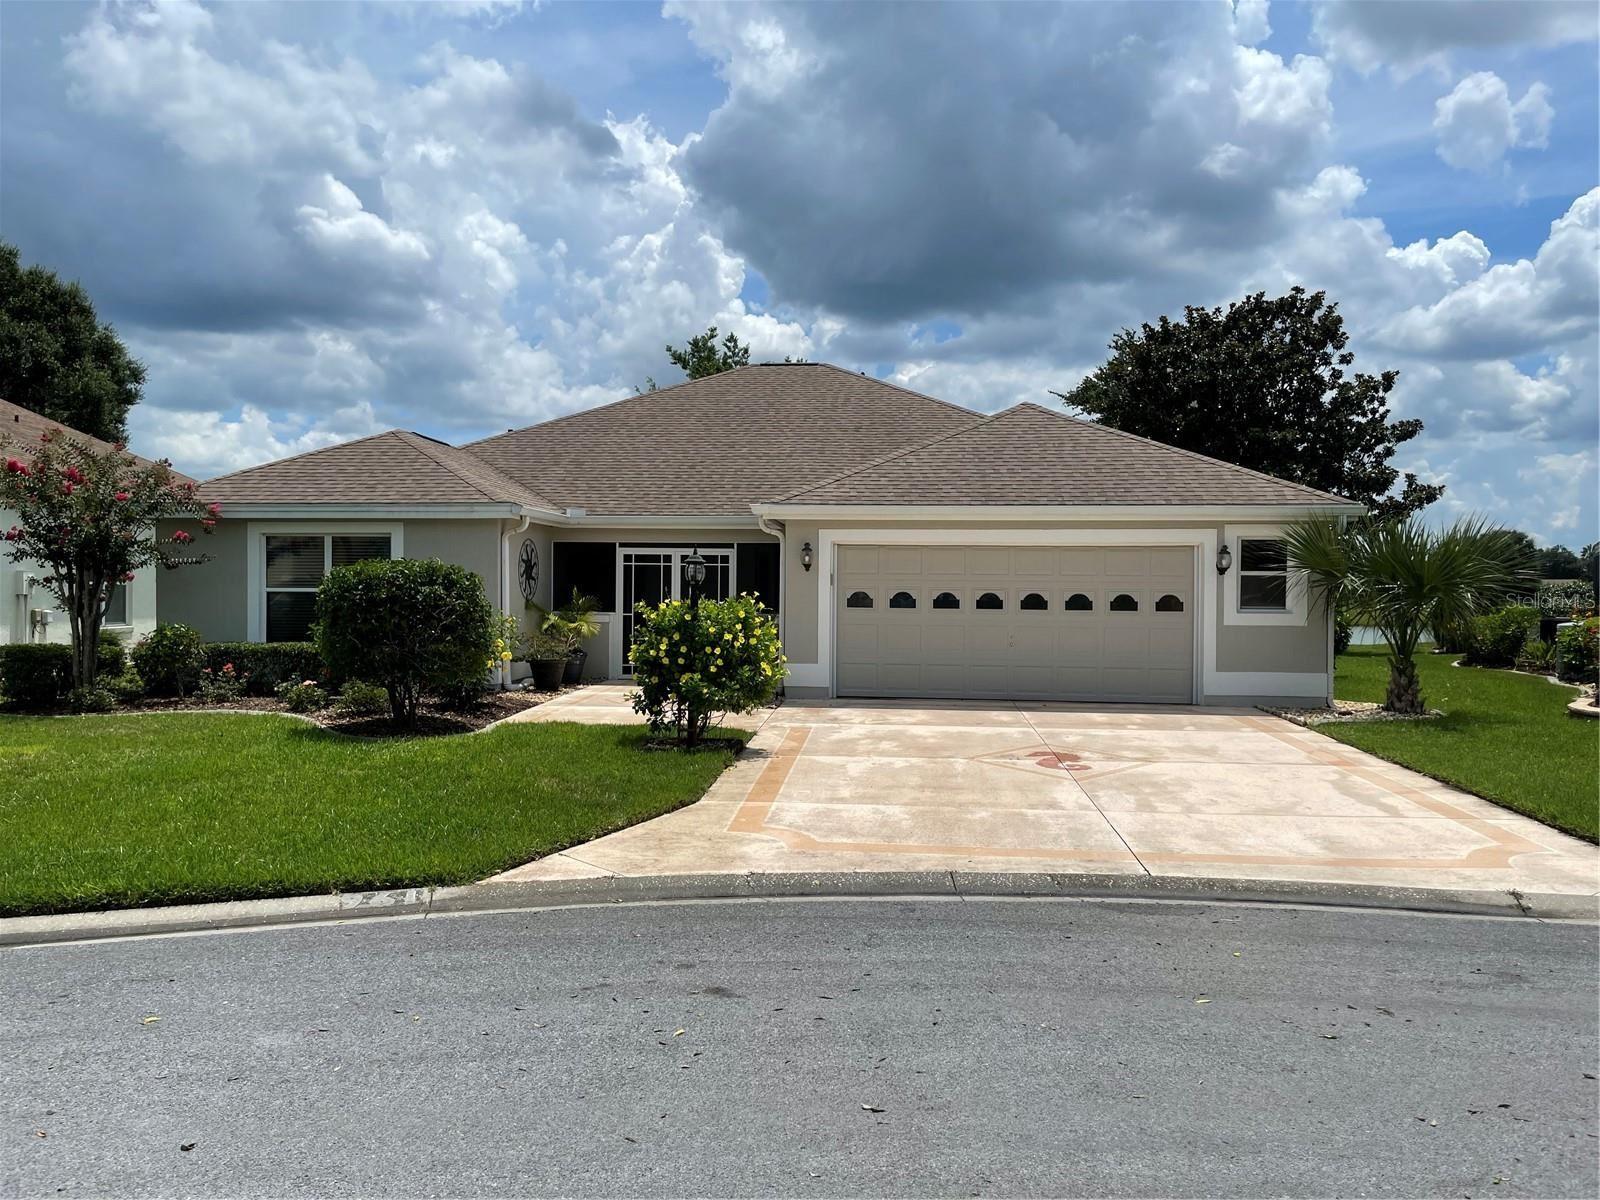 961 LUNA LANE, The Villages, FL 32159 - #: G5044536